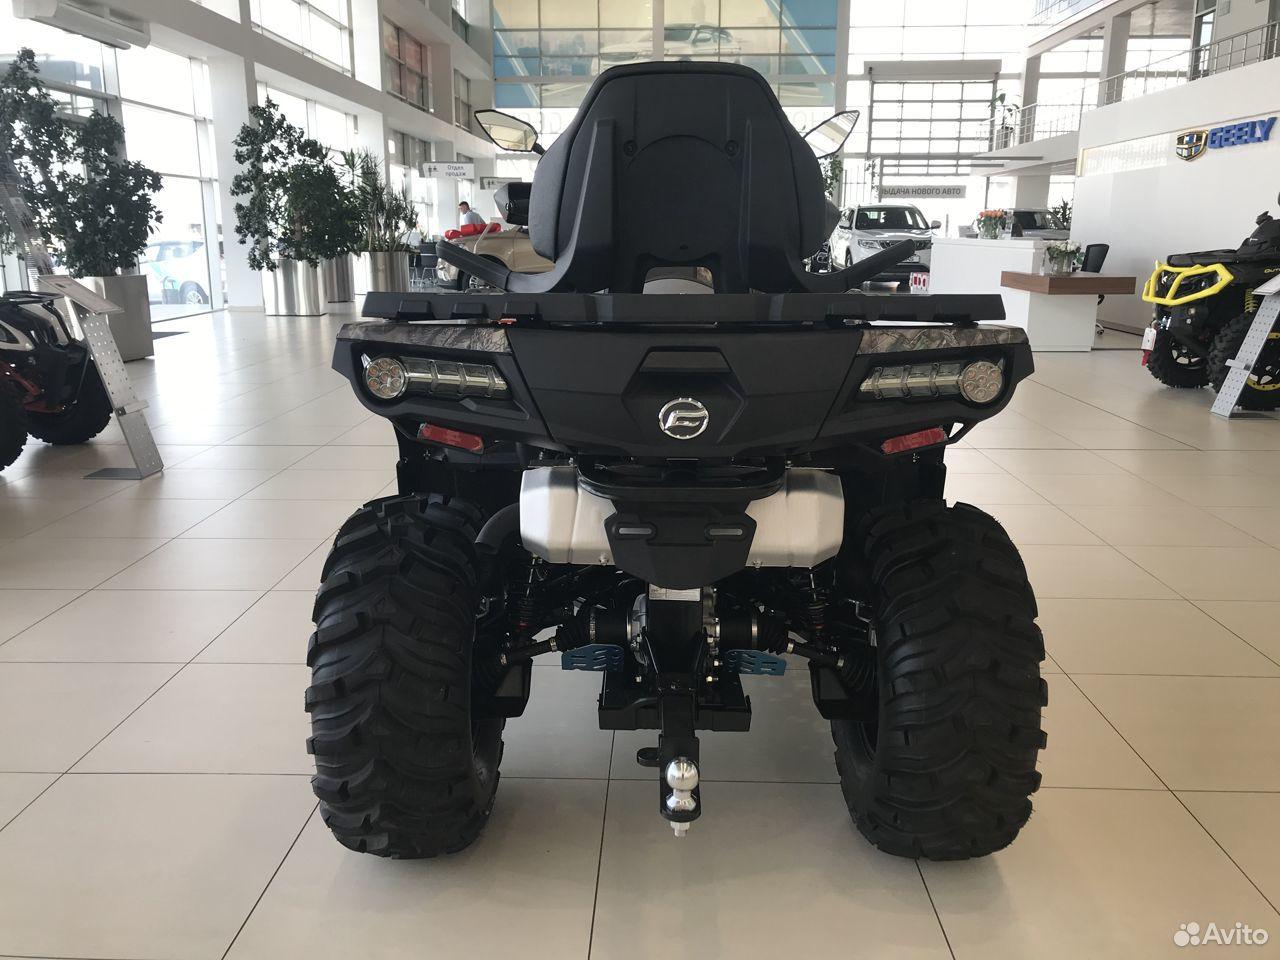 Квадроцикл cfmoto cforce 800 HO EPS (X8 H.O.EPS)  88792225000 купить 3